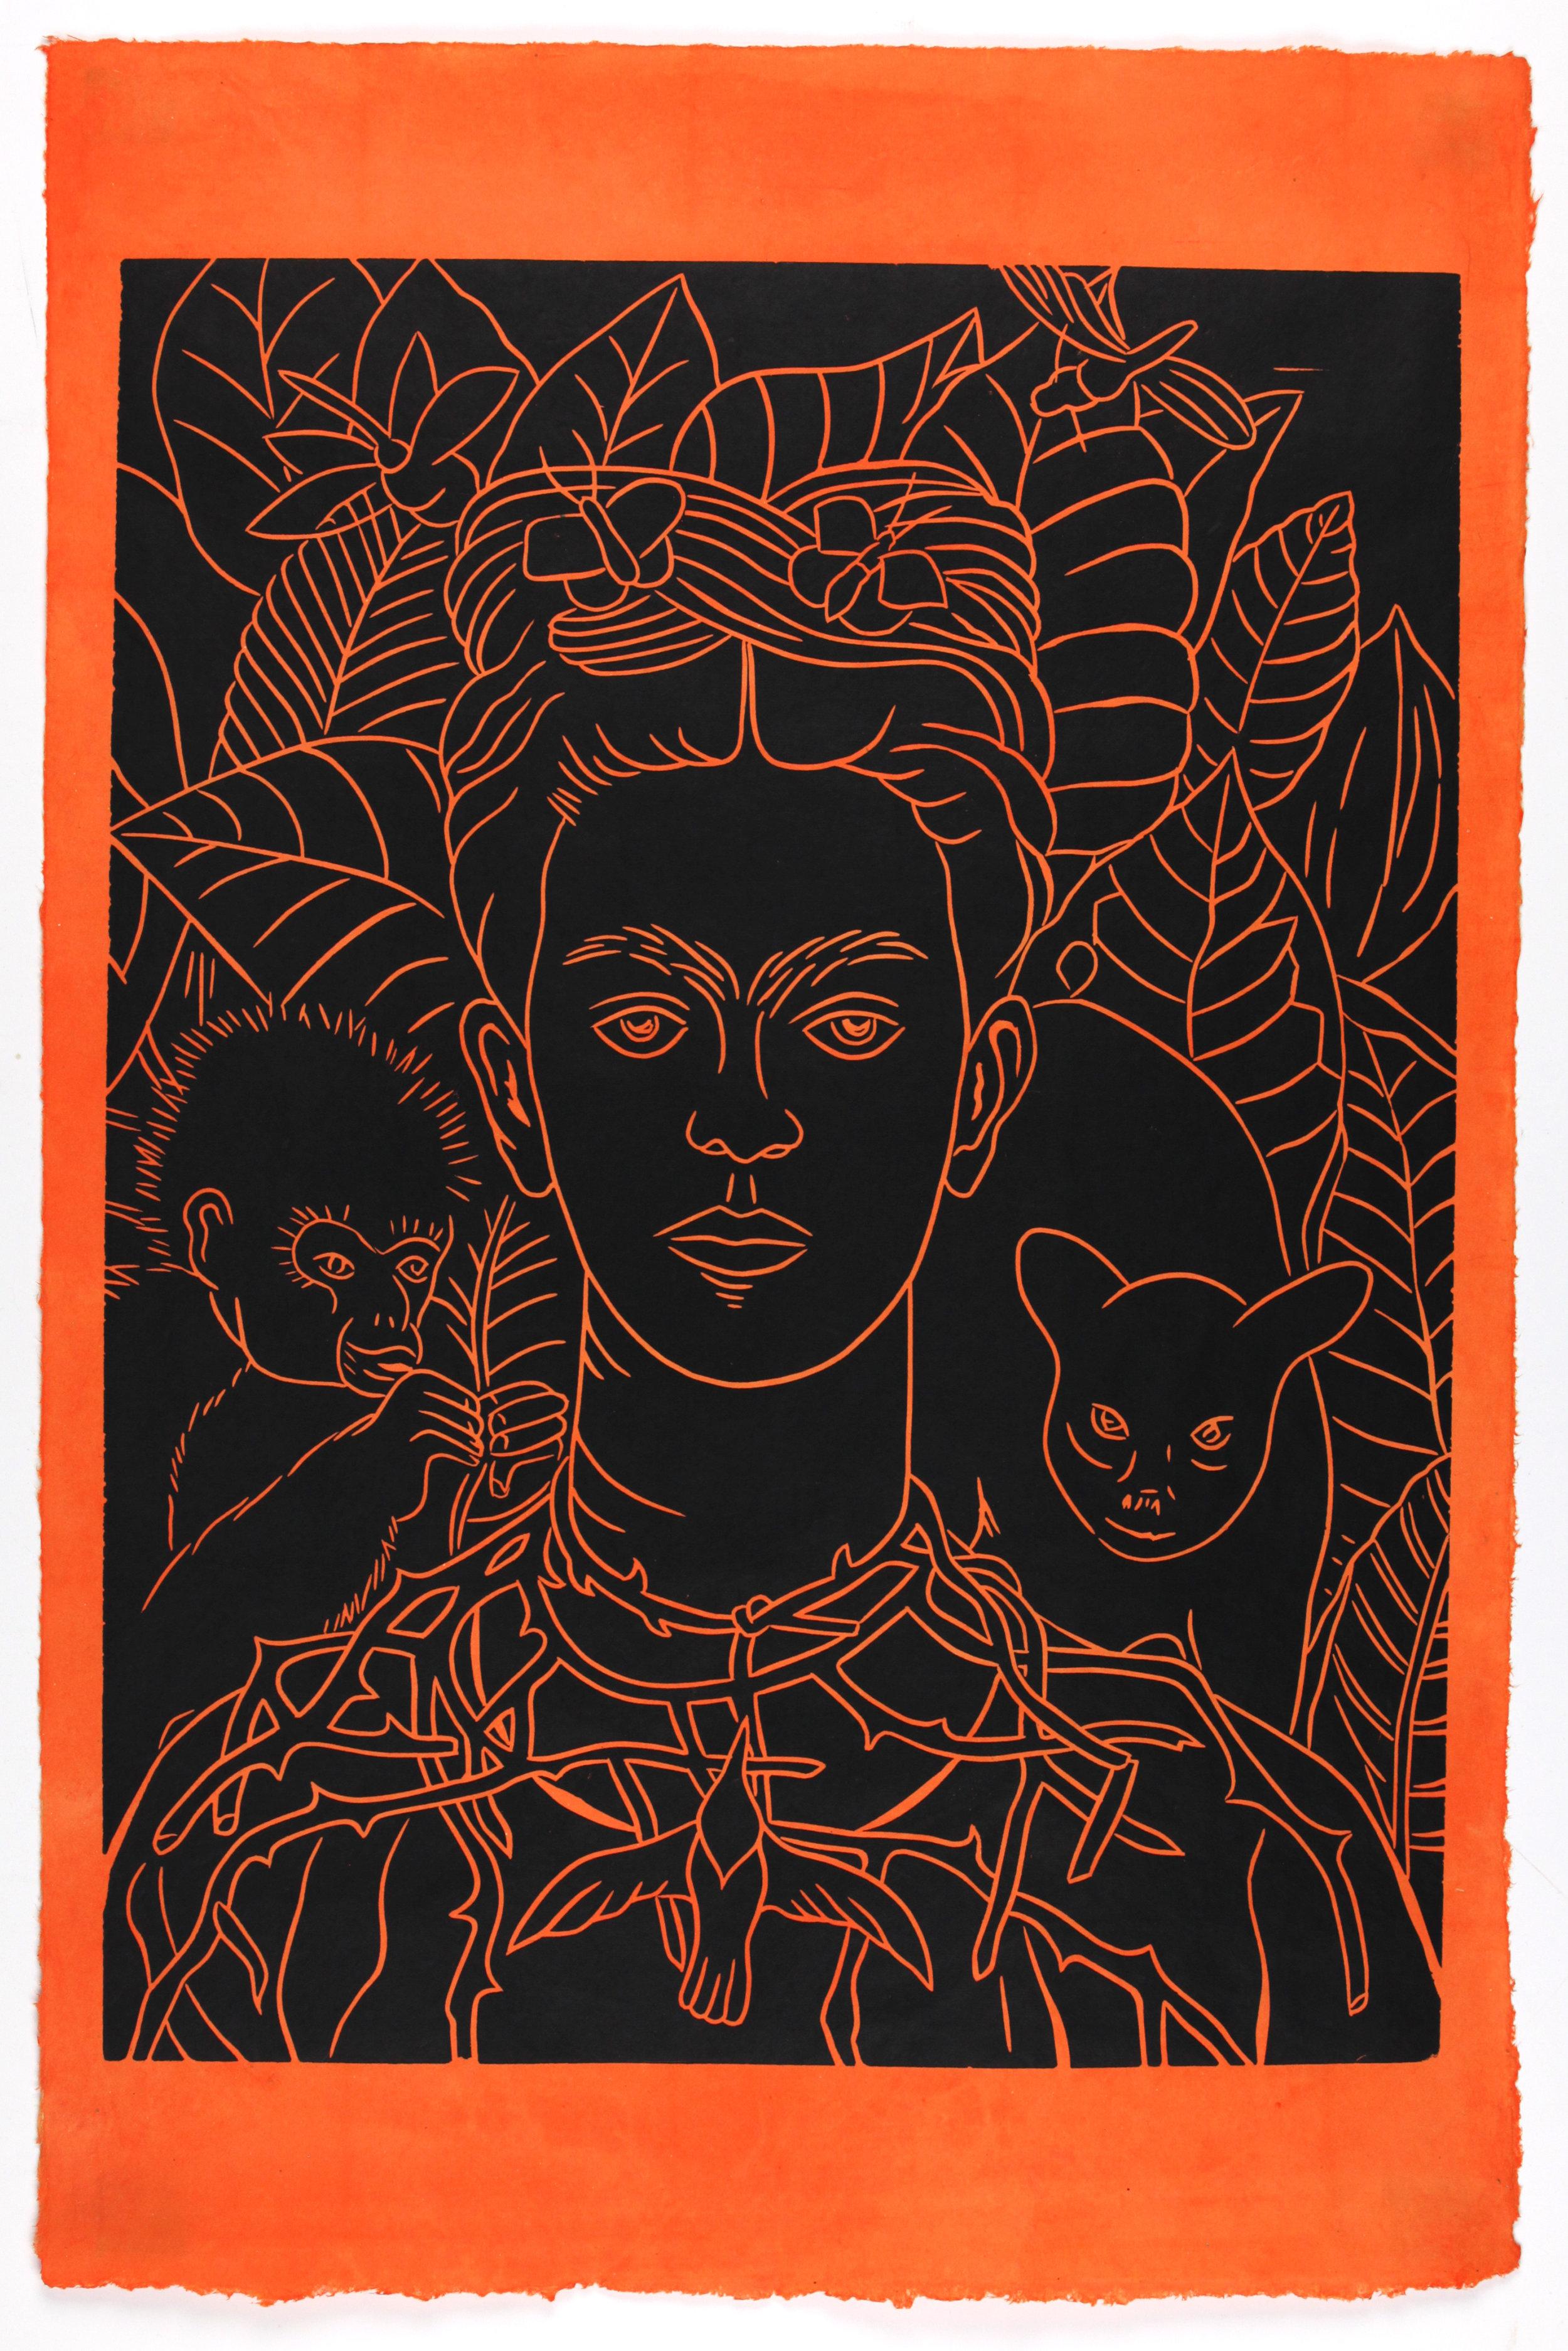 Armando Rodriguez, Frida Naranja, 2019. Linocut on hand-dyed Lotka  Paper